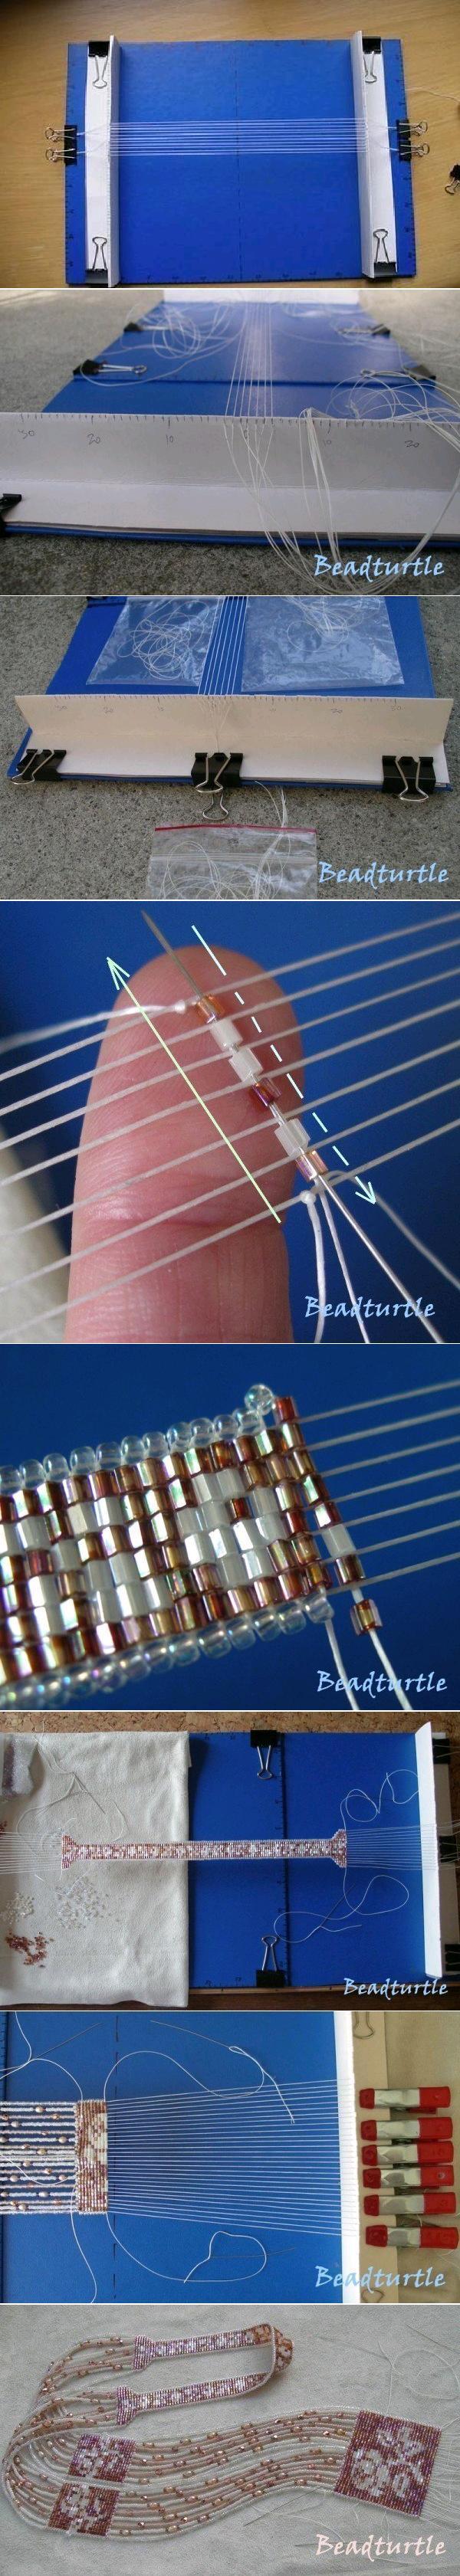 diy, diy projects, diy craft, handmade, diy ideas, diy handmade beading machine